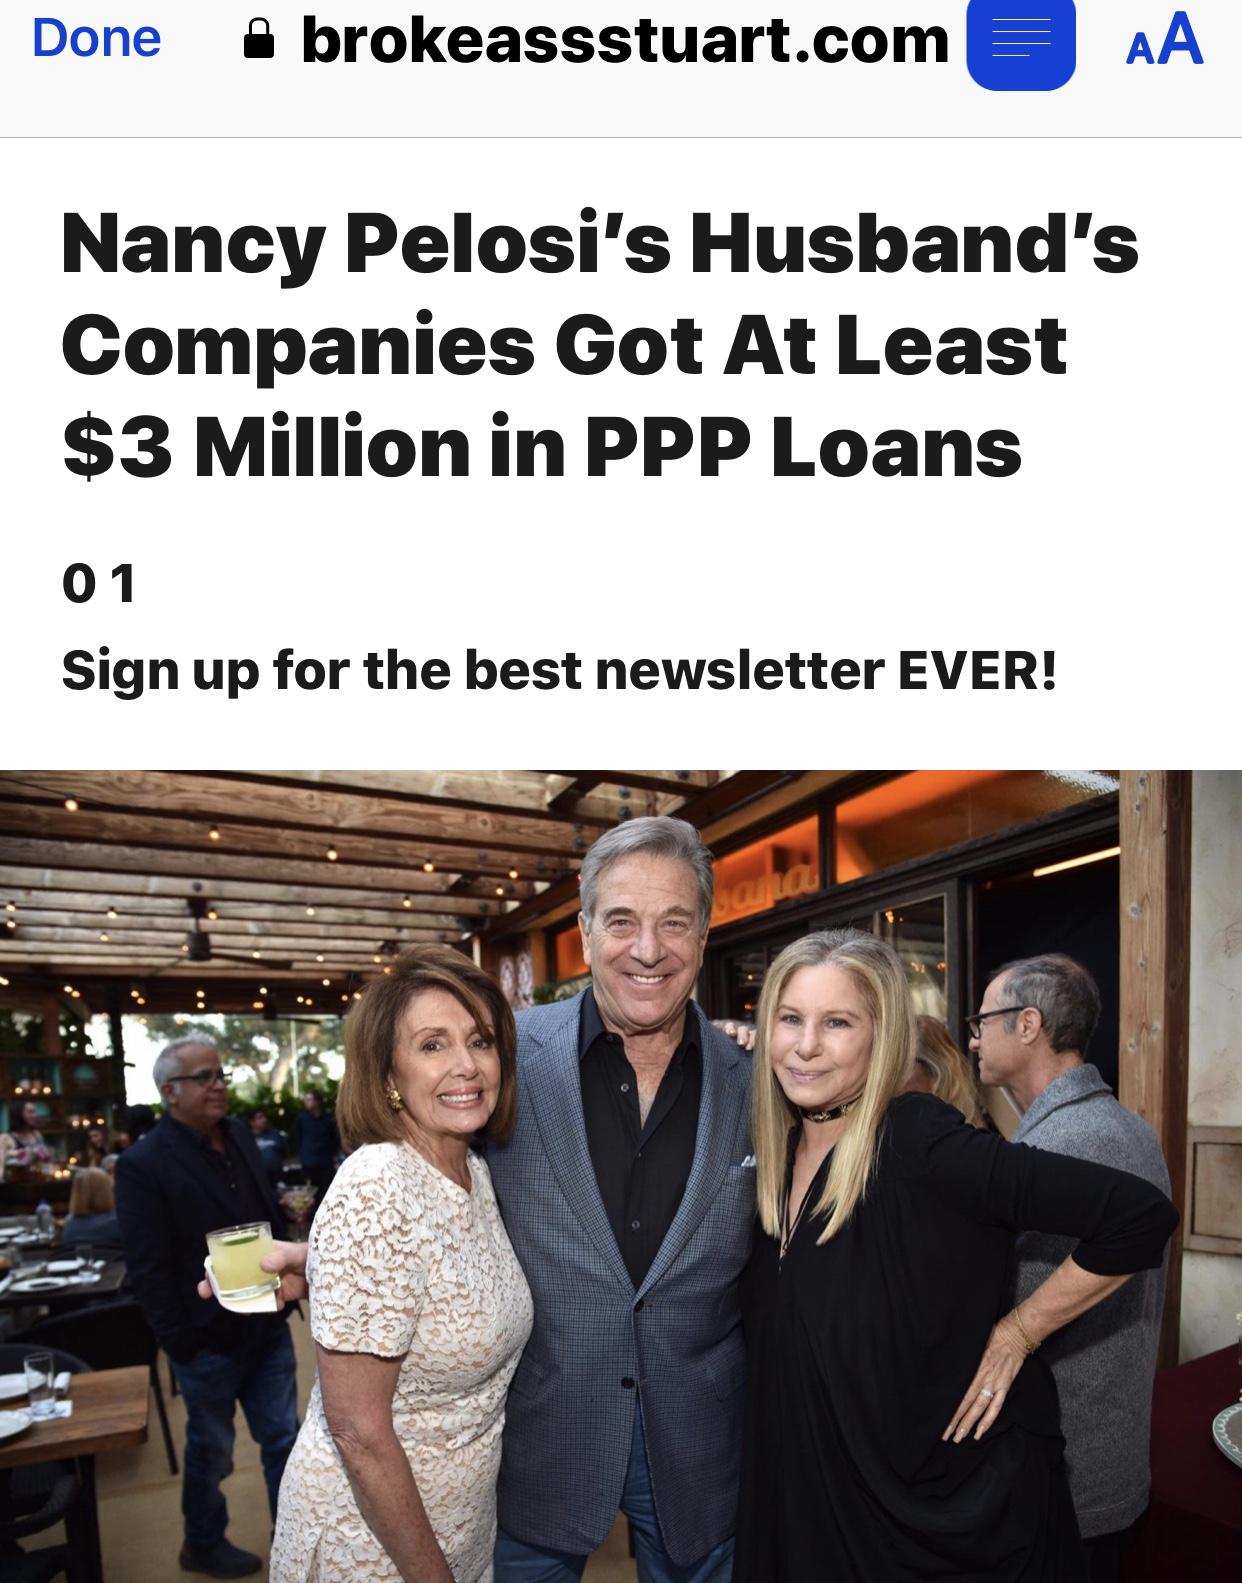 NANCY PELOSI'S HUSBAND'S COMPANIES GOT AT LEAST $3 MILLION IN PPP LOANS